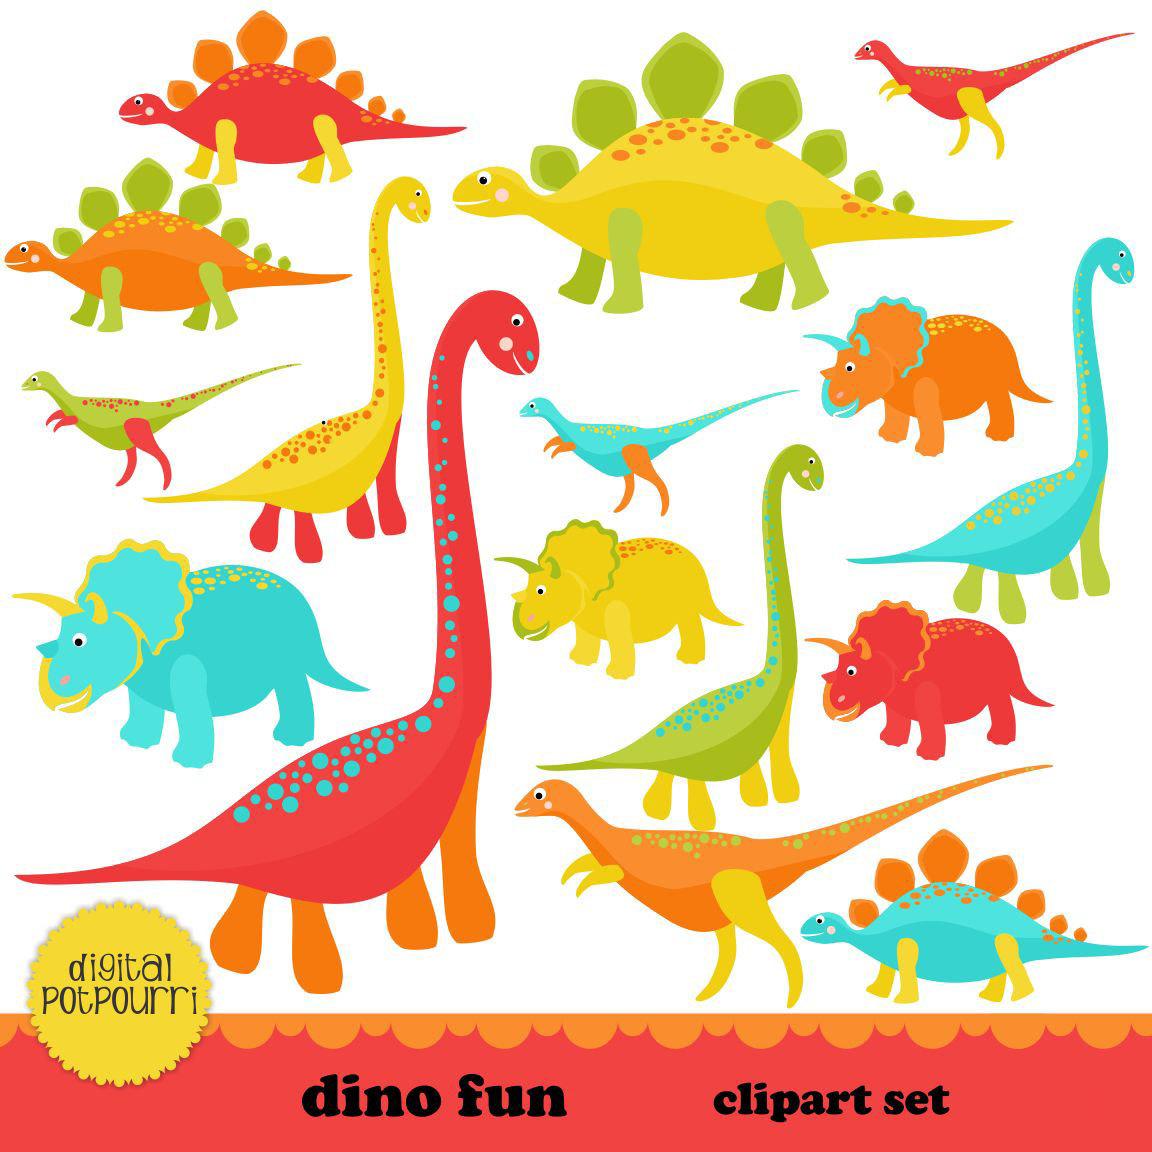 Coture clipart diverse student Set dino INSTANT INSTANT dinosaur